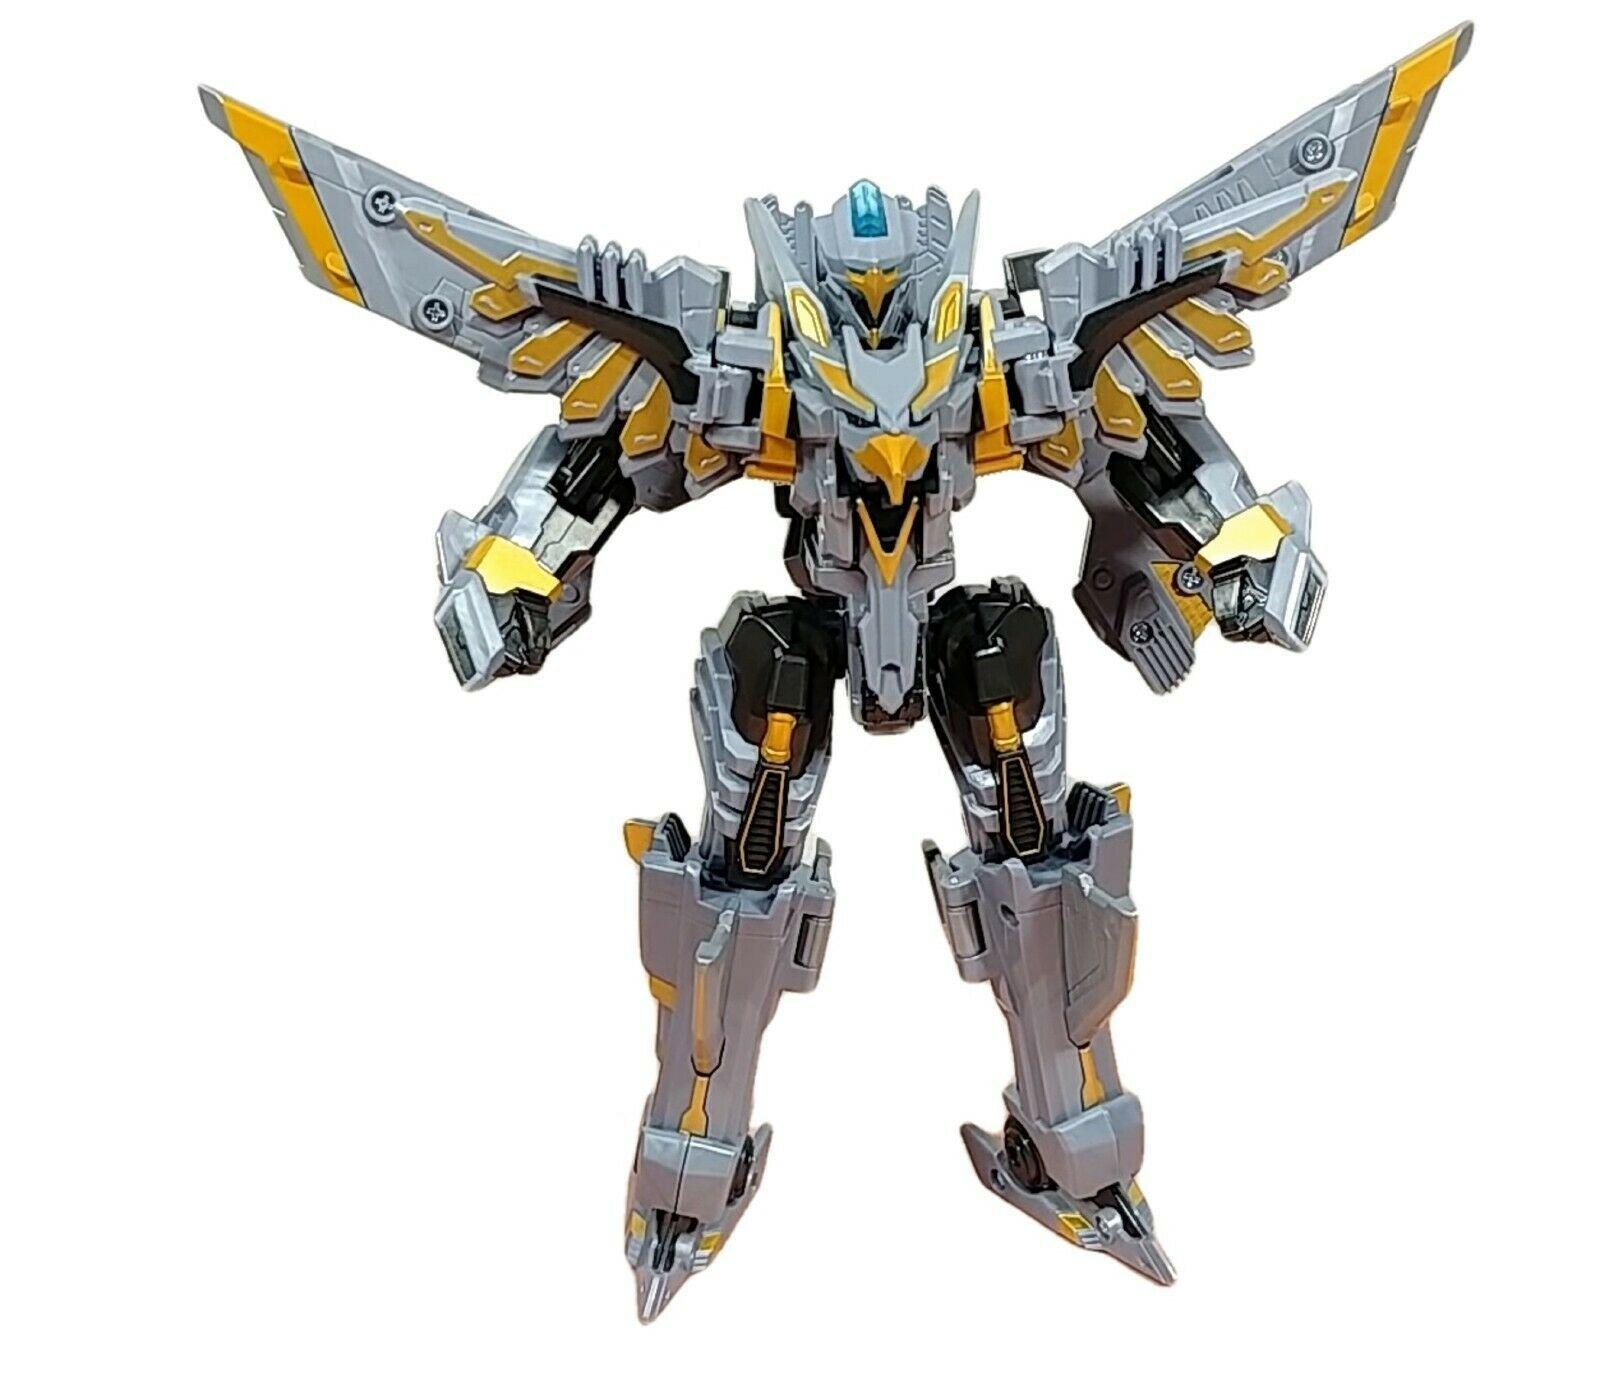 Tobot Silver Hawk Action Figure Toy Robot